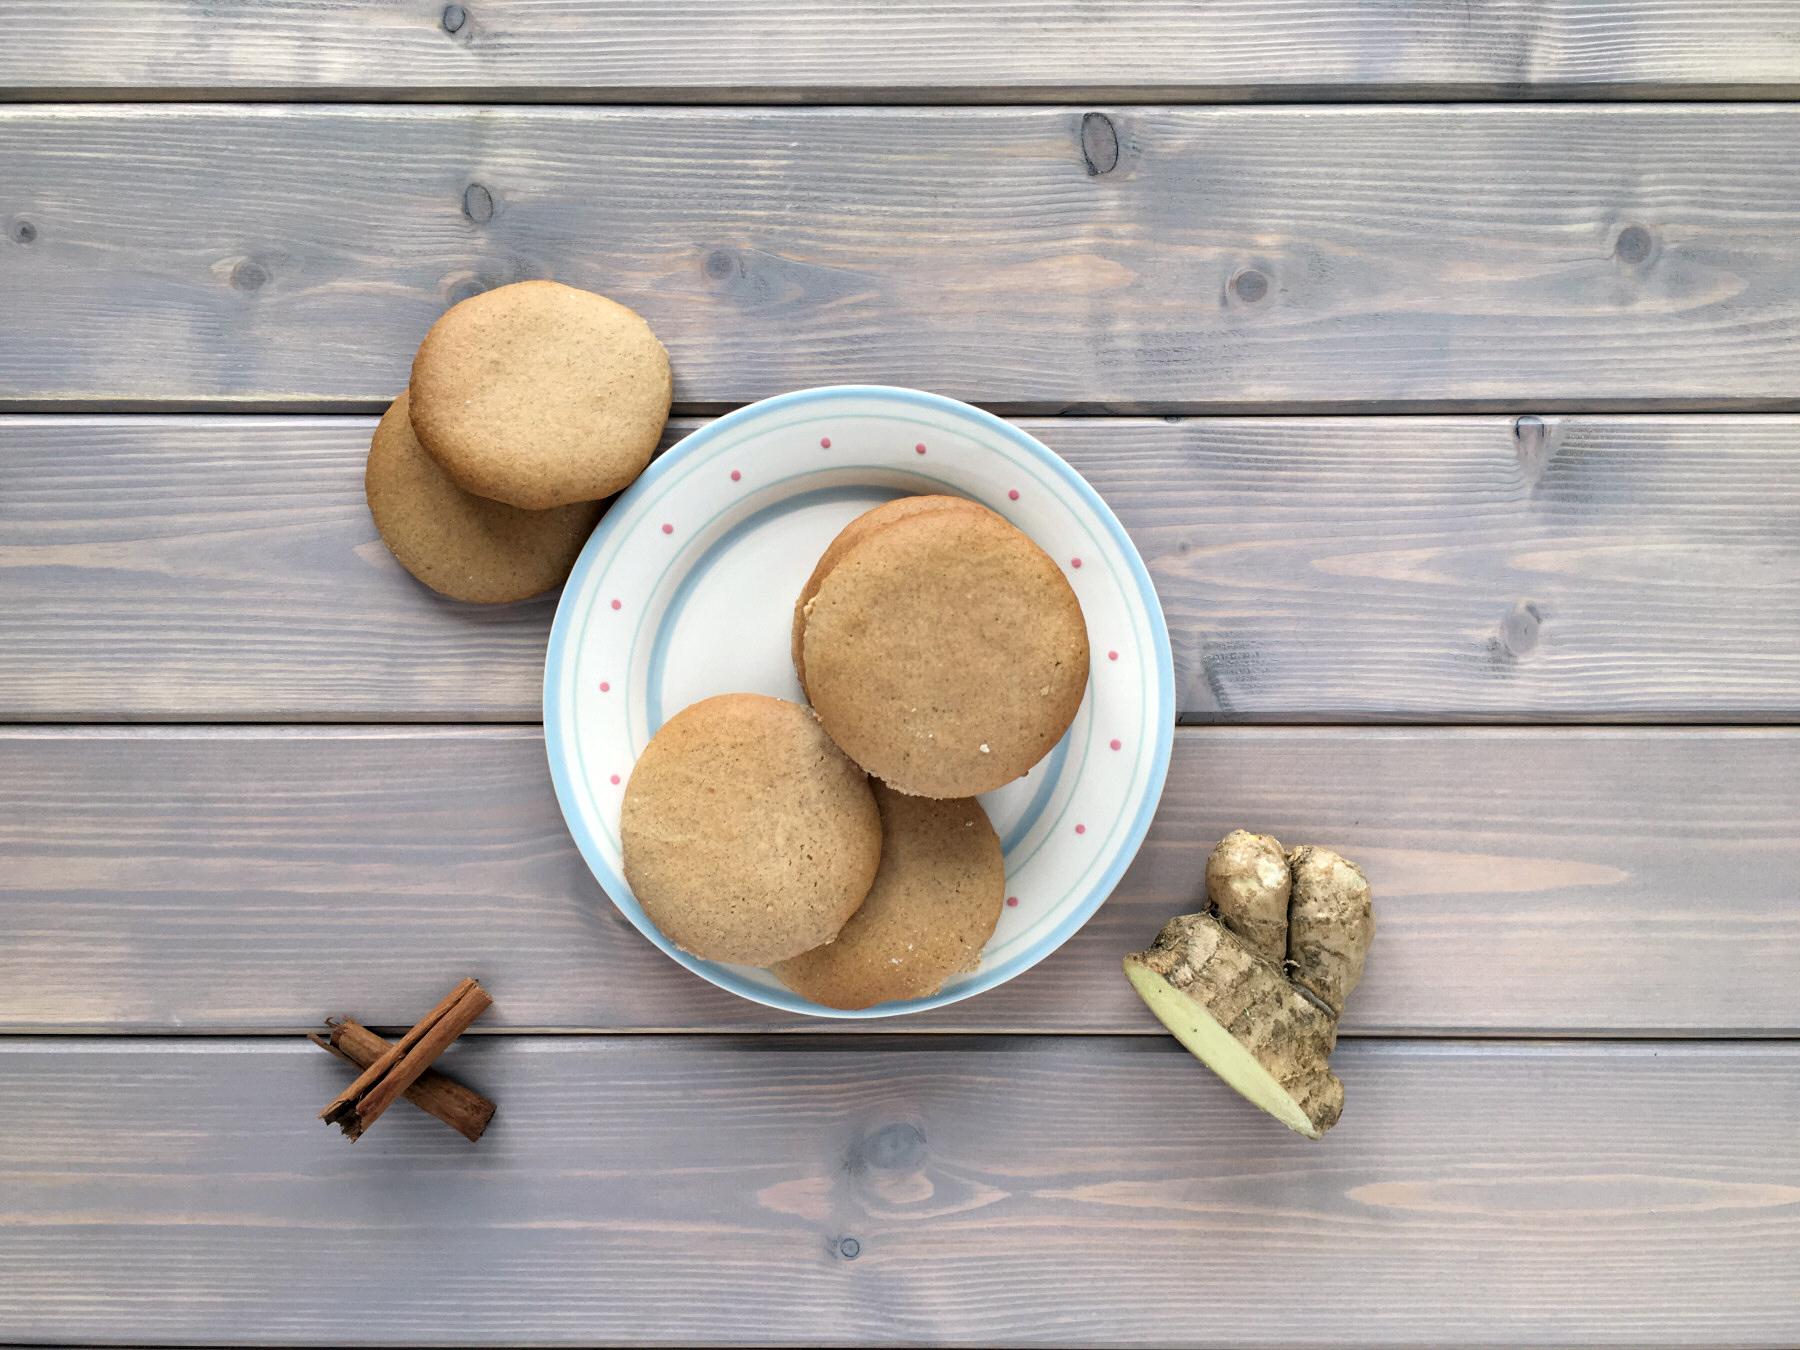 Refined Sugar Free Gingerbread Cookies Cakezero Sugar Free Cakes Cookies Sweet Treats